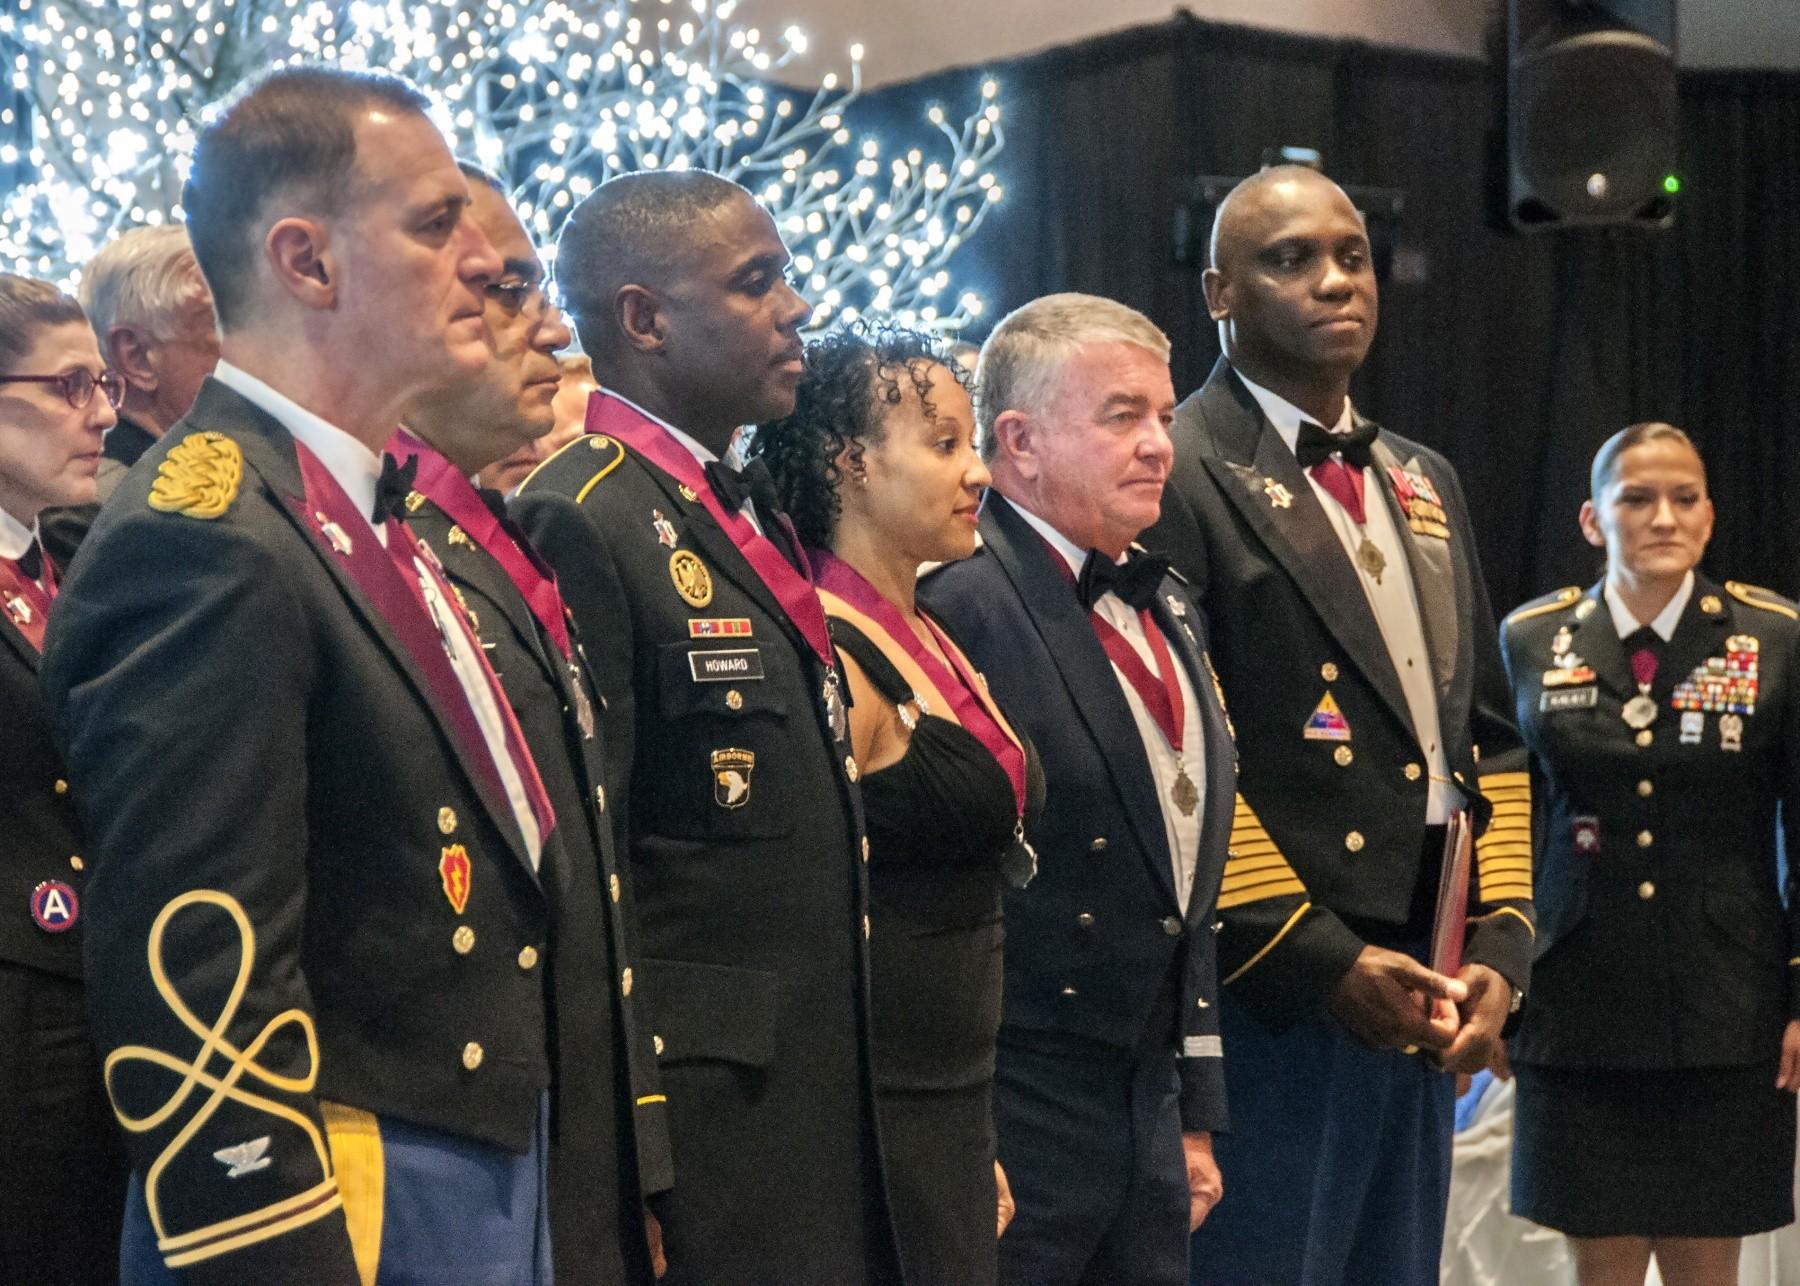 Former Air Force Medicine Top Brass Keynoter At Wbamc